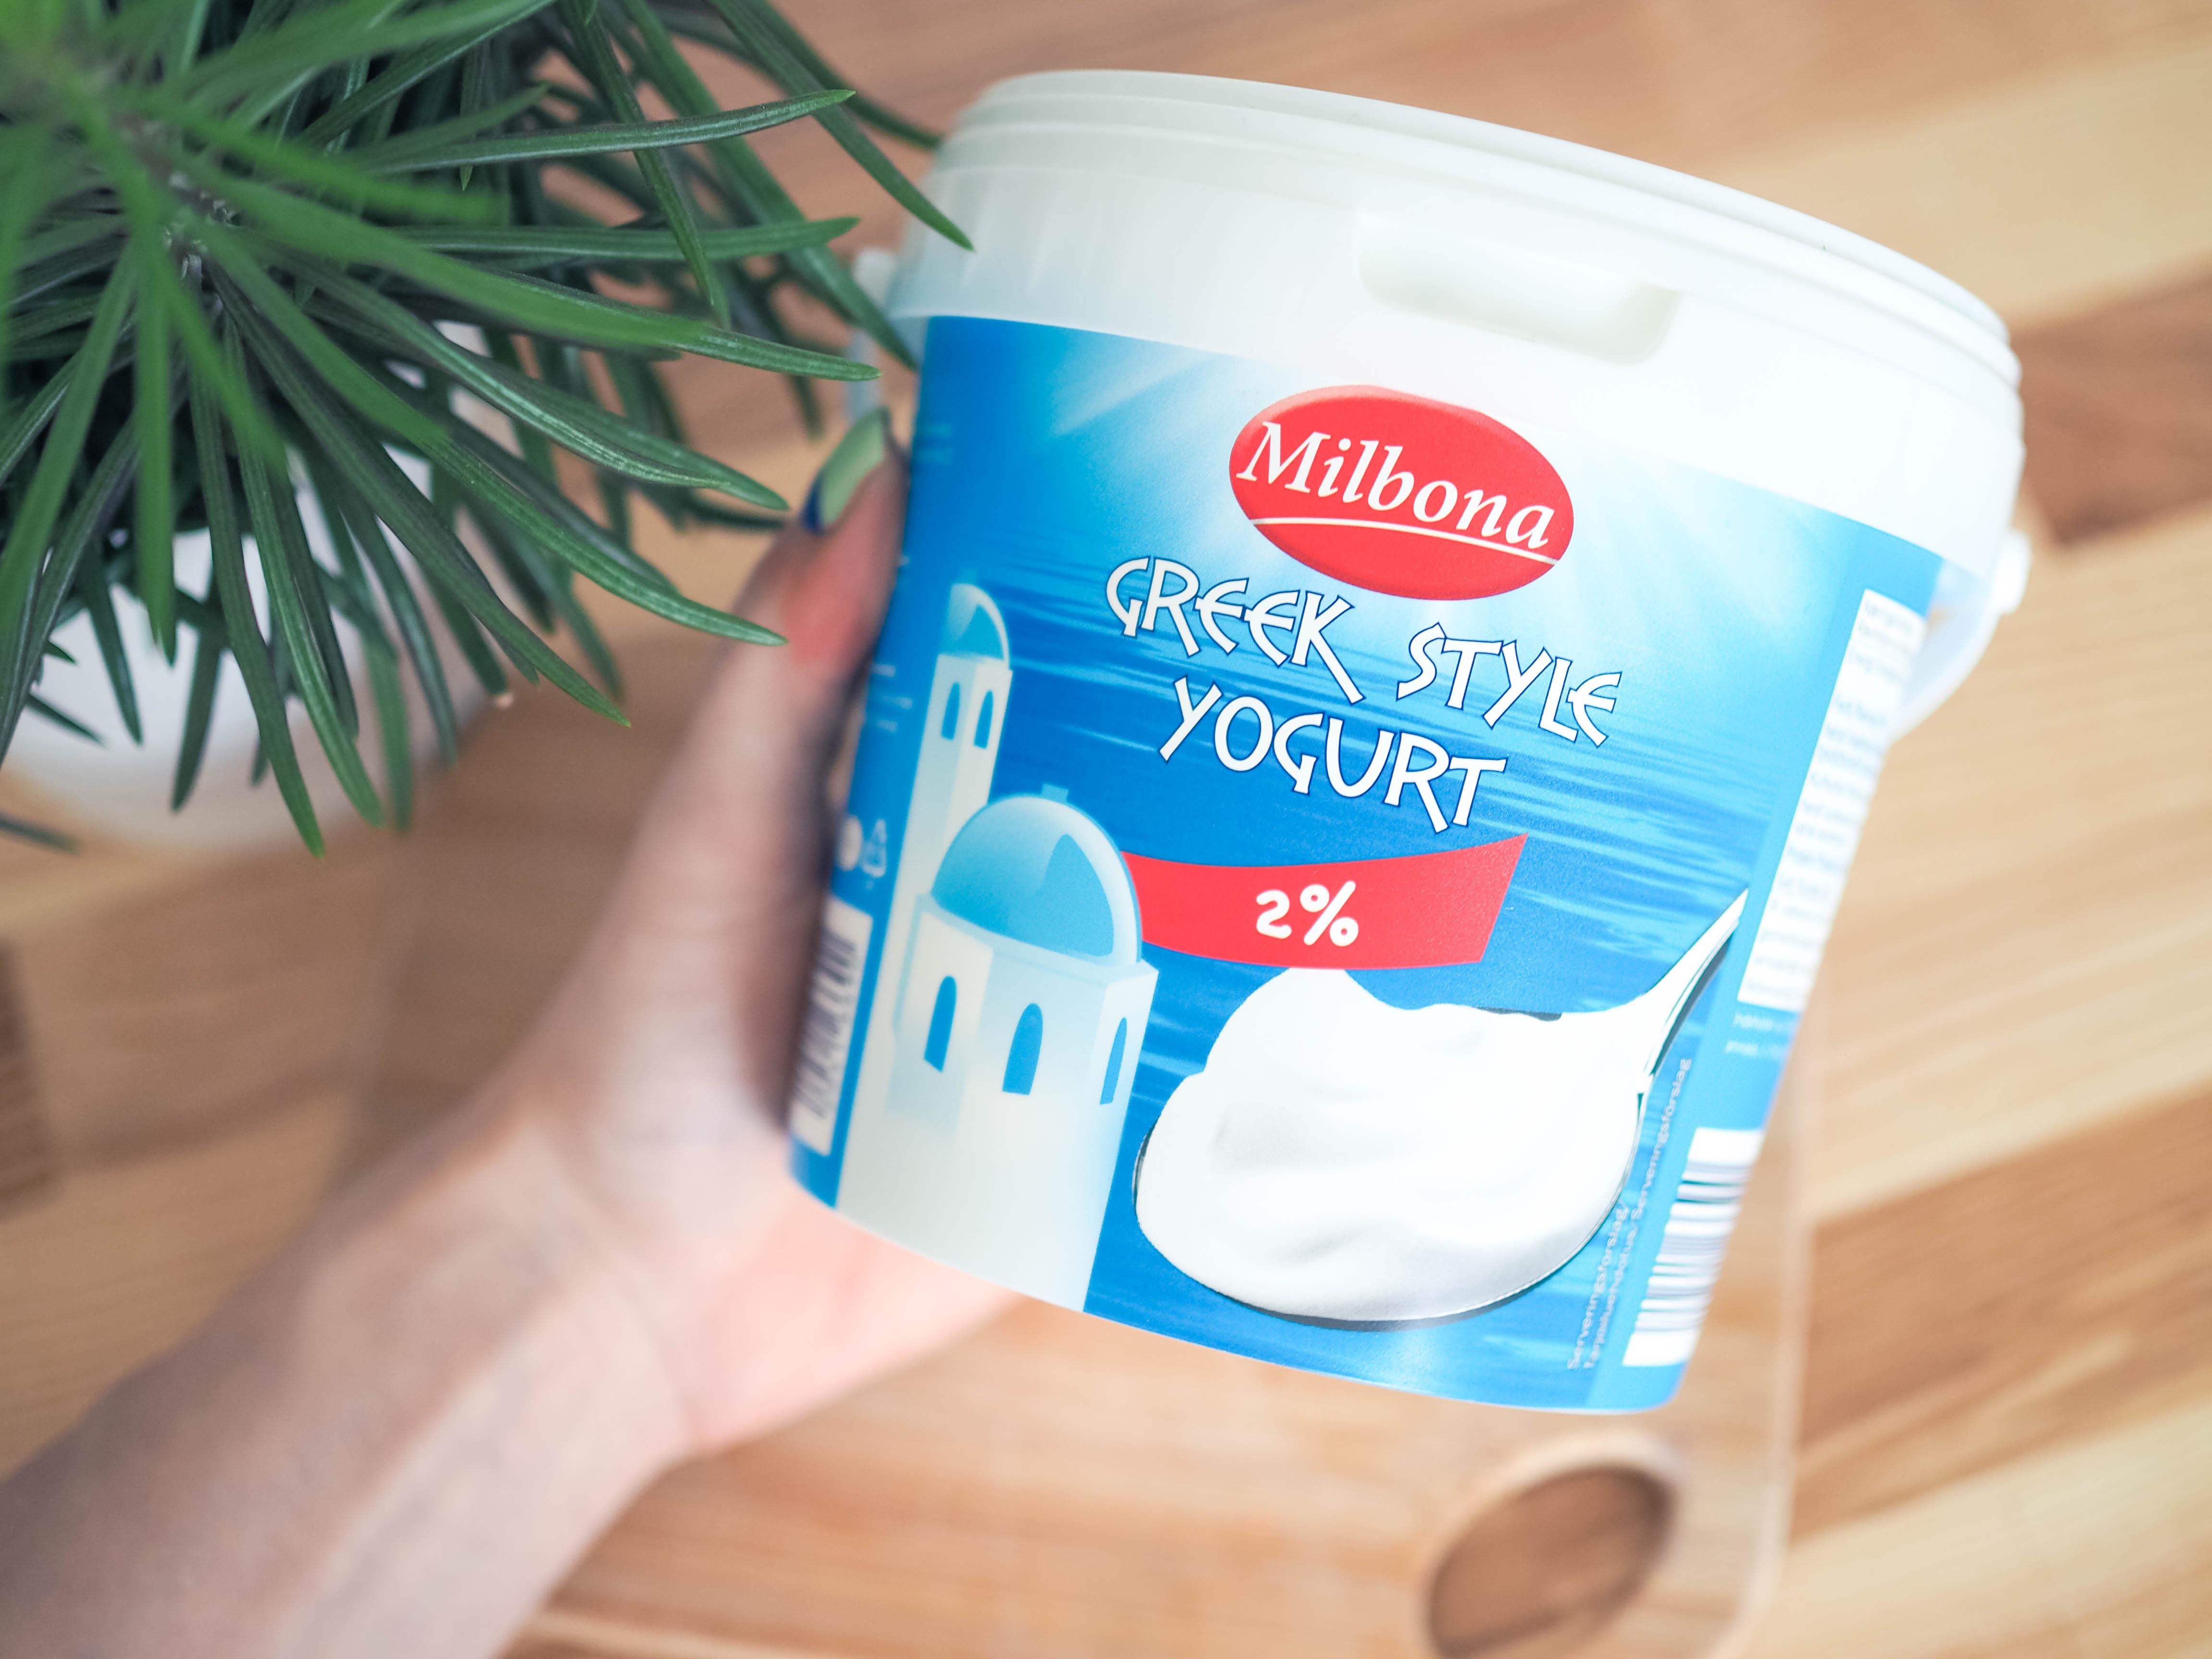 milbona greek style lidl